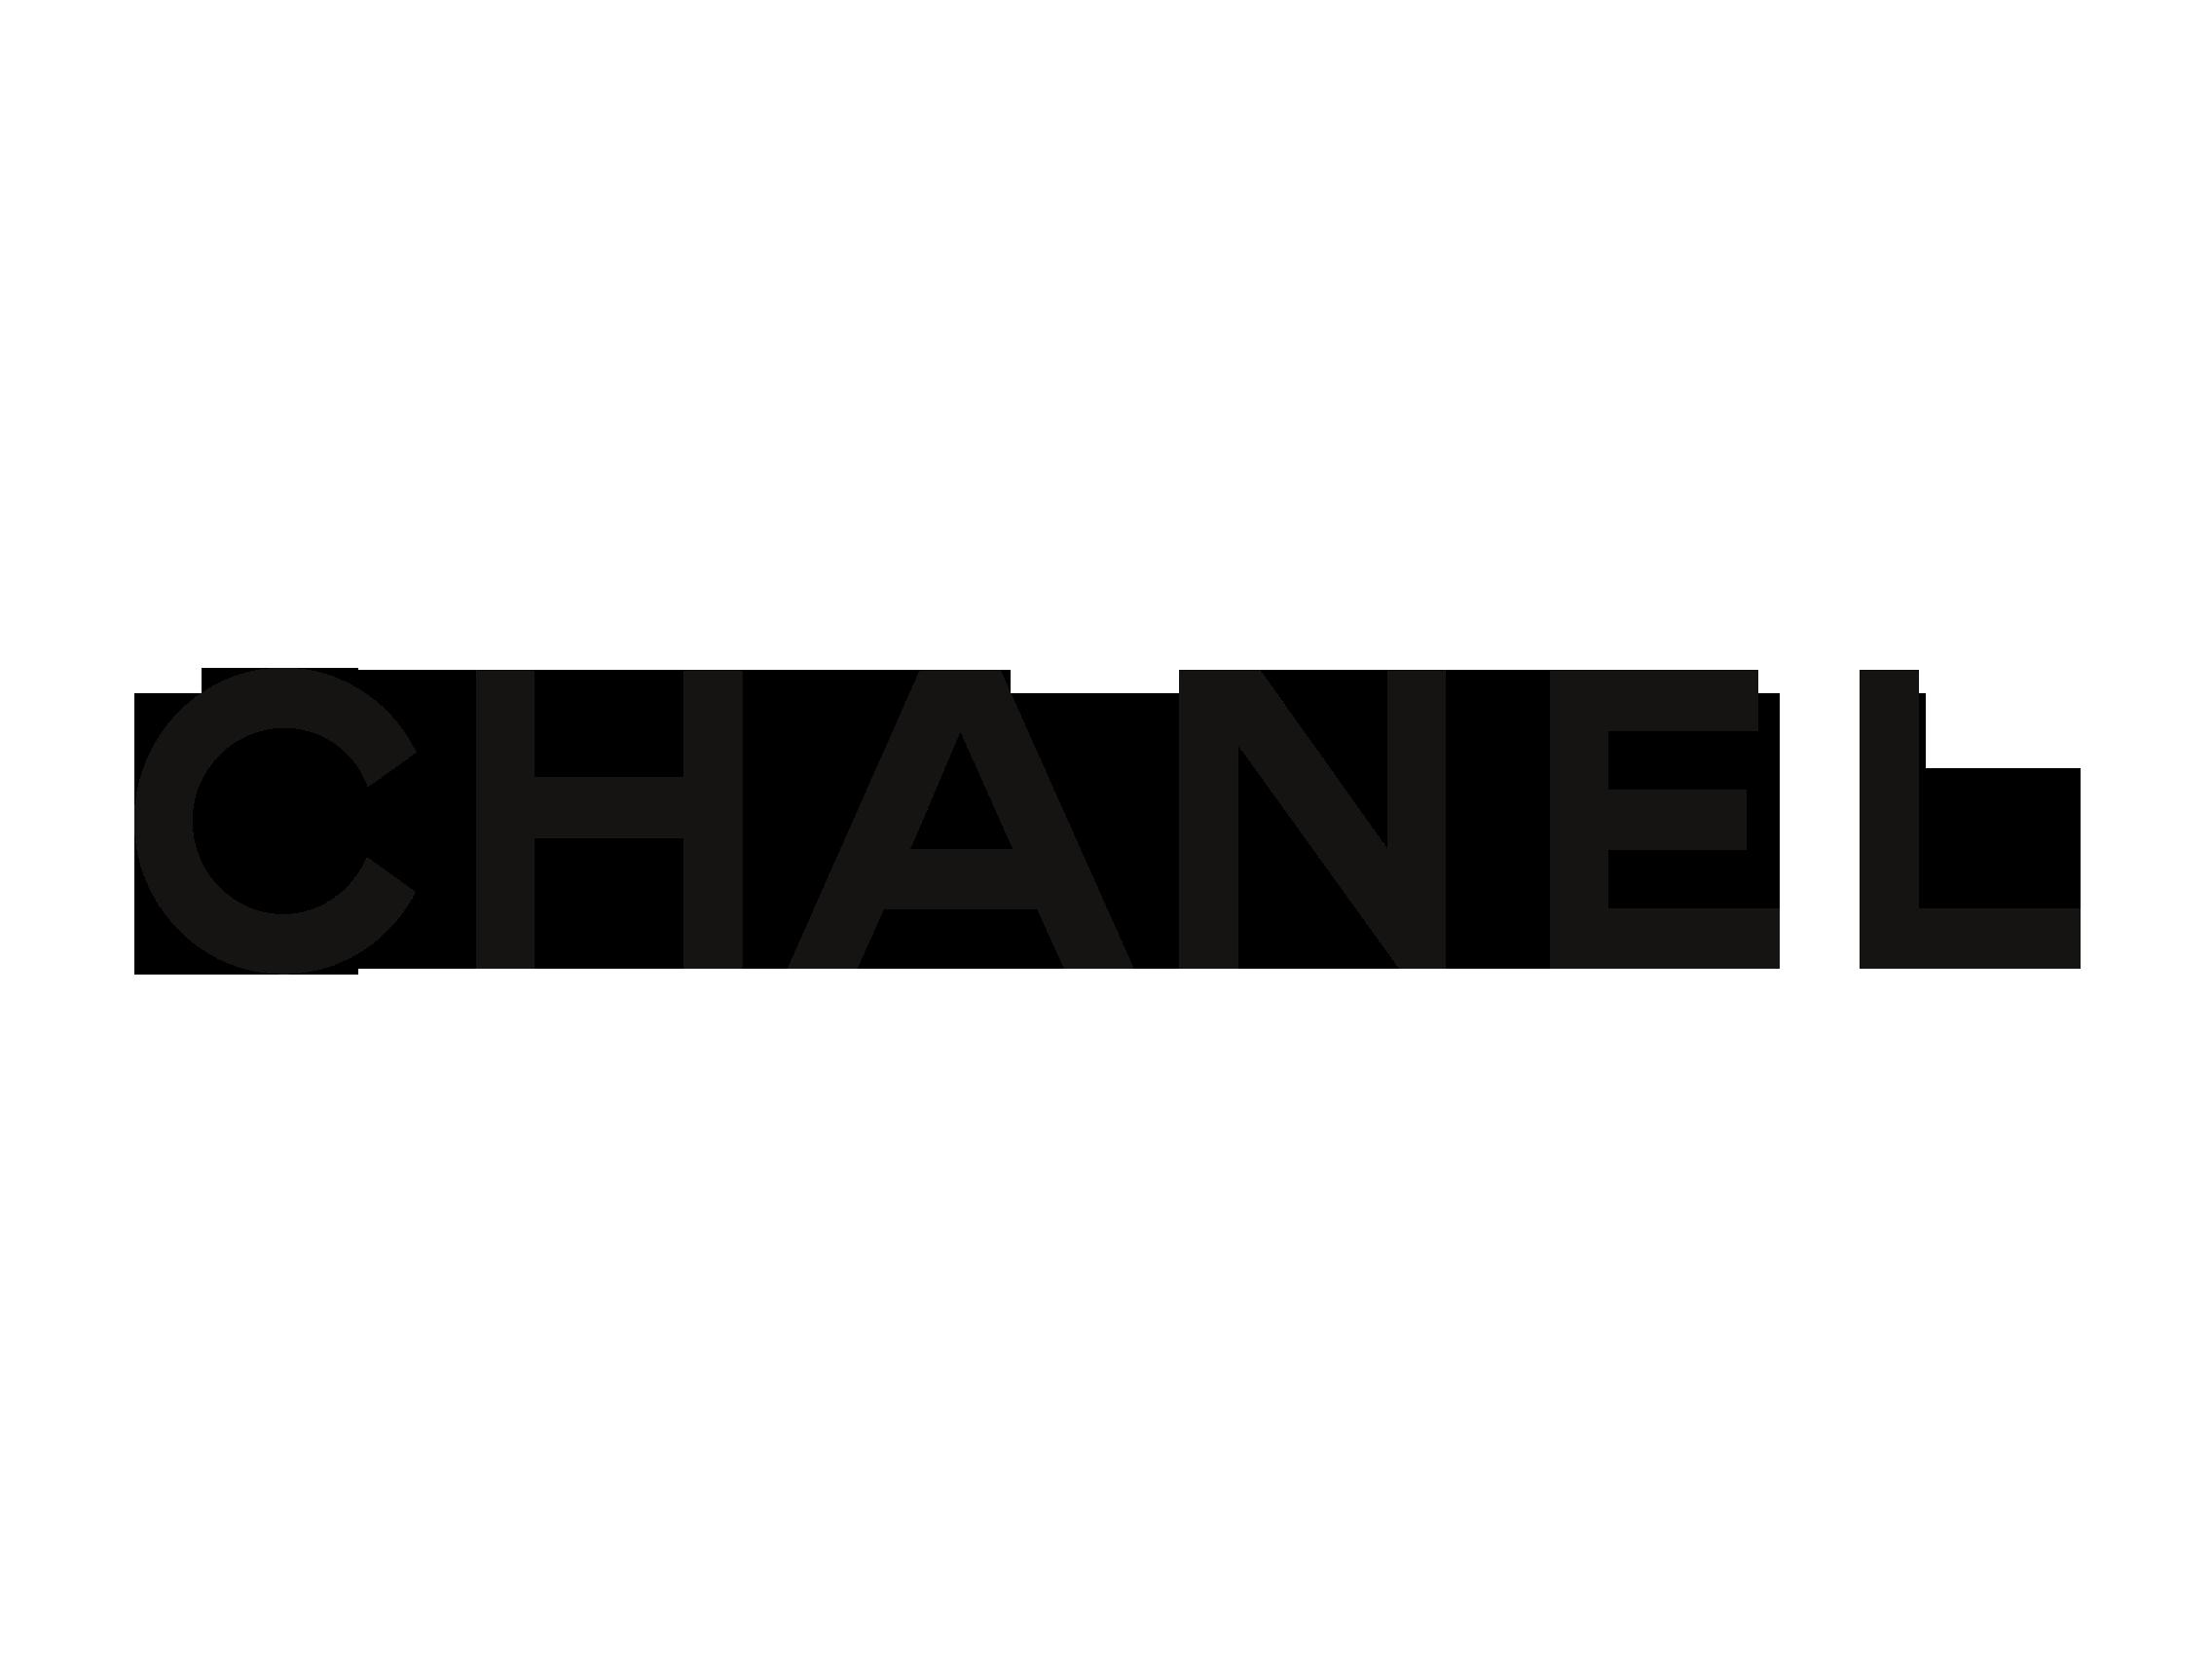 Download Chanel Logo Image Hq Png Image | Freepngimg - Chanel Logo PNG